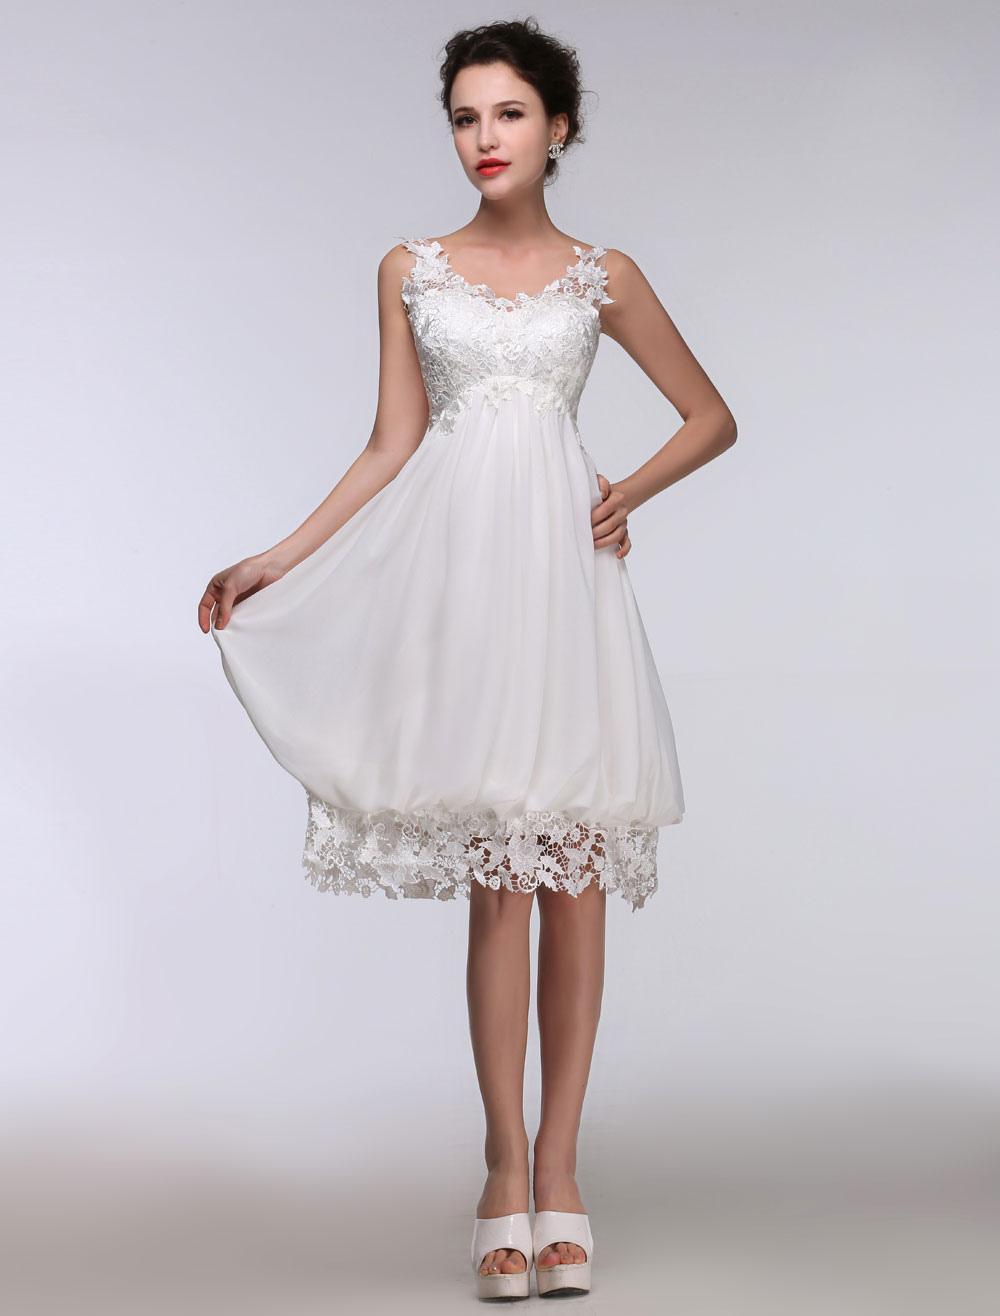 04972cb09233 Short Wedding Dress White Lace Chiffon Sweetheart Summer Wedding ...